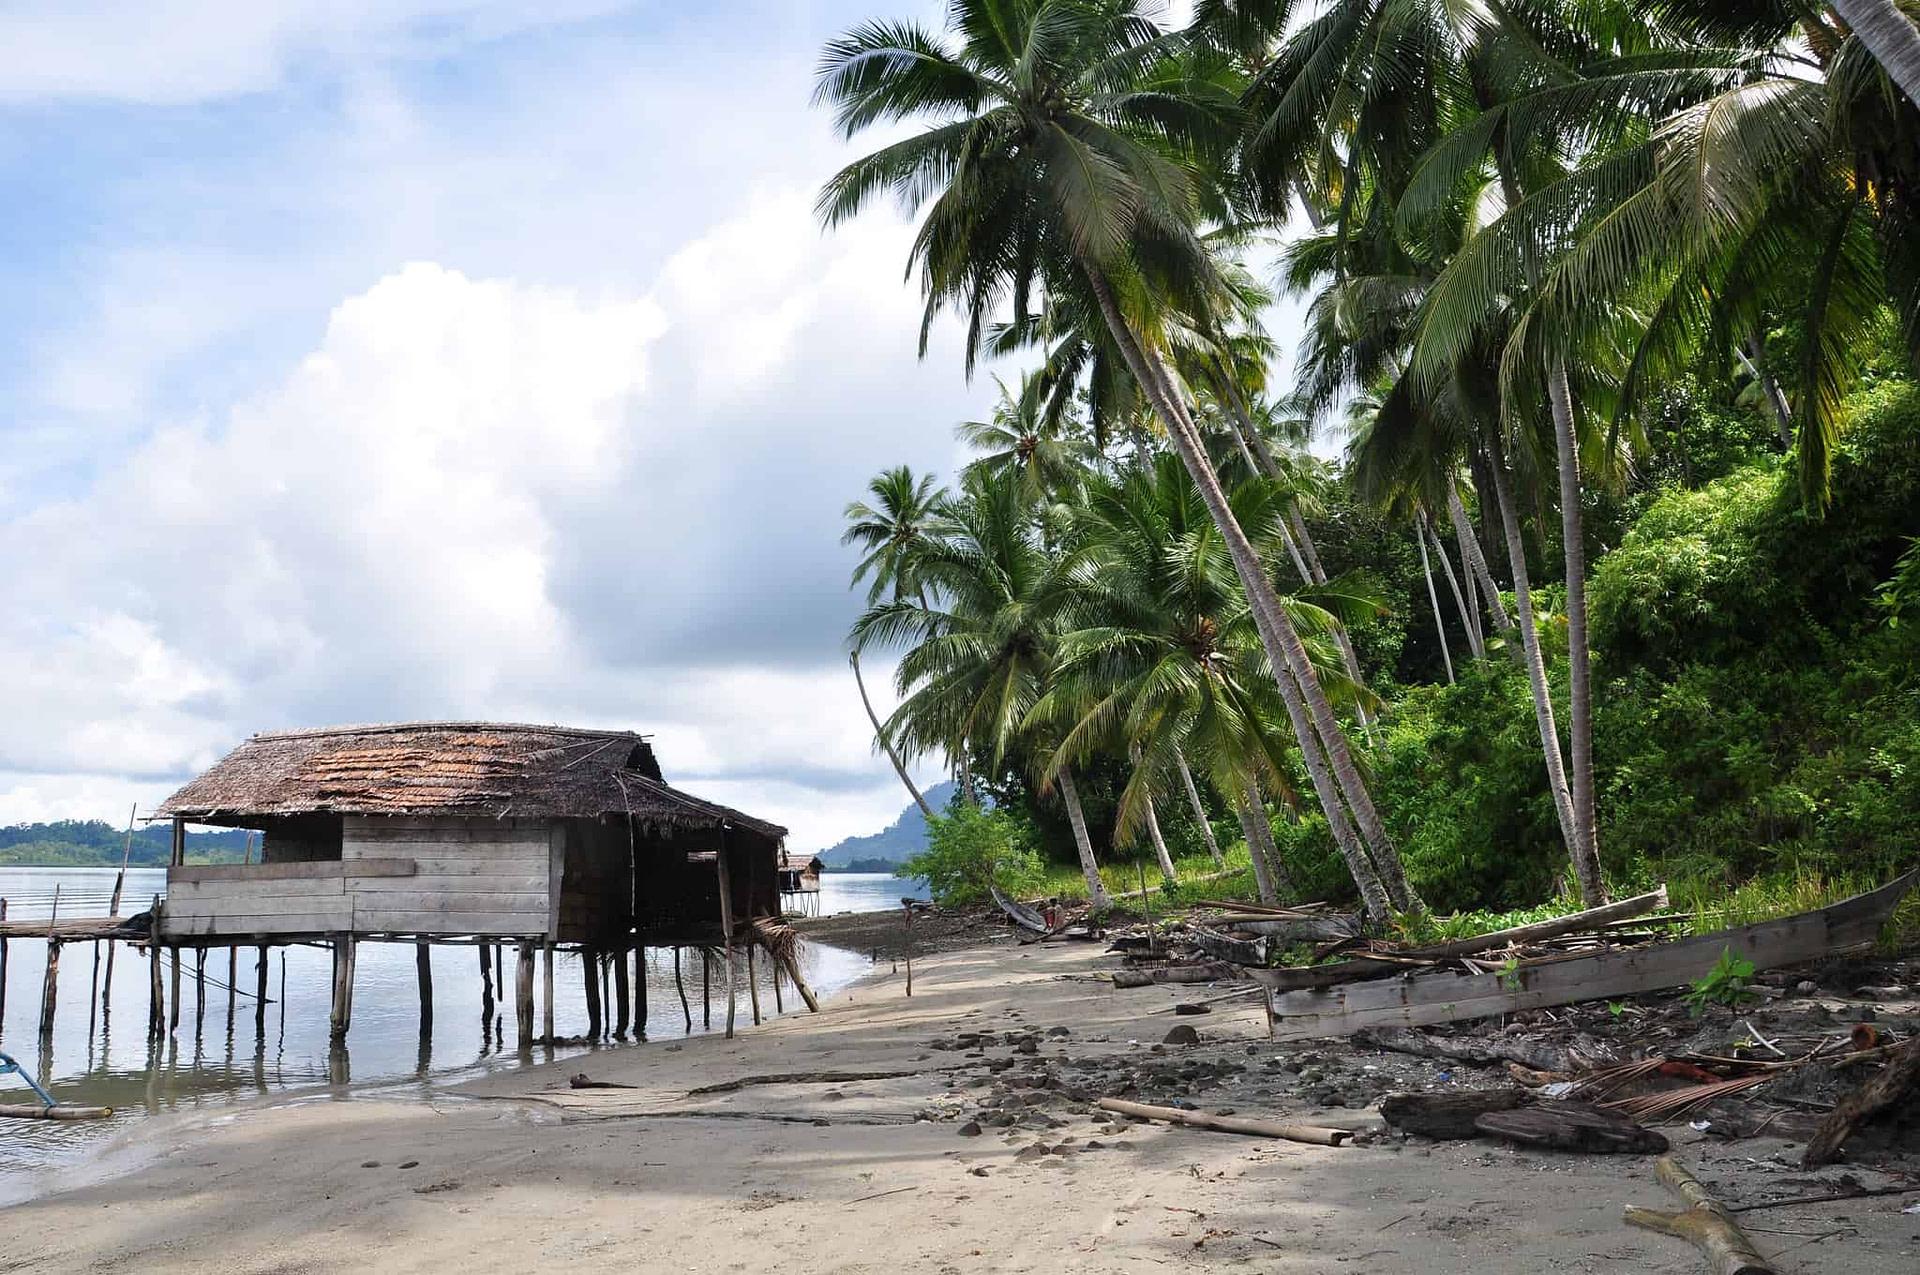 Tropical Beach - Jelle Visser, Creative Commons BY 2.0